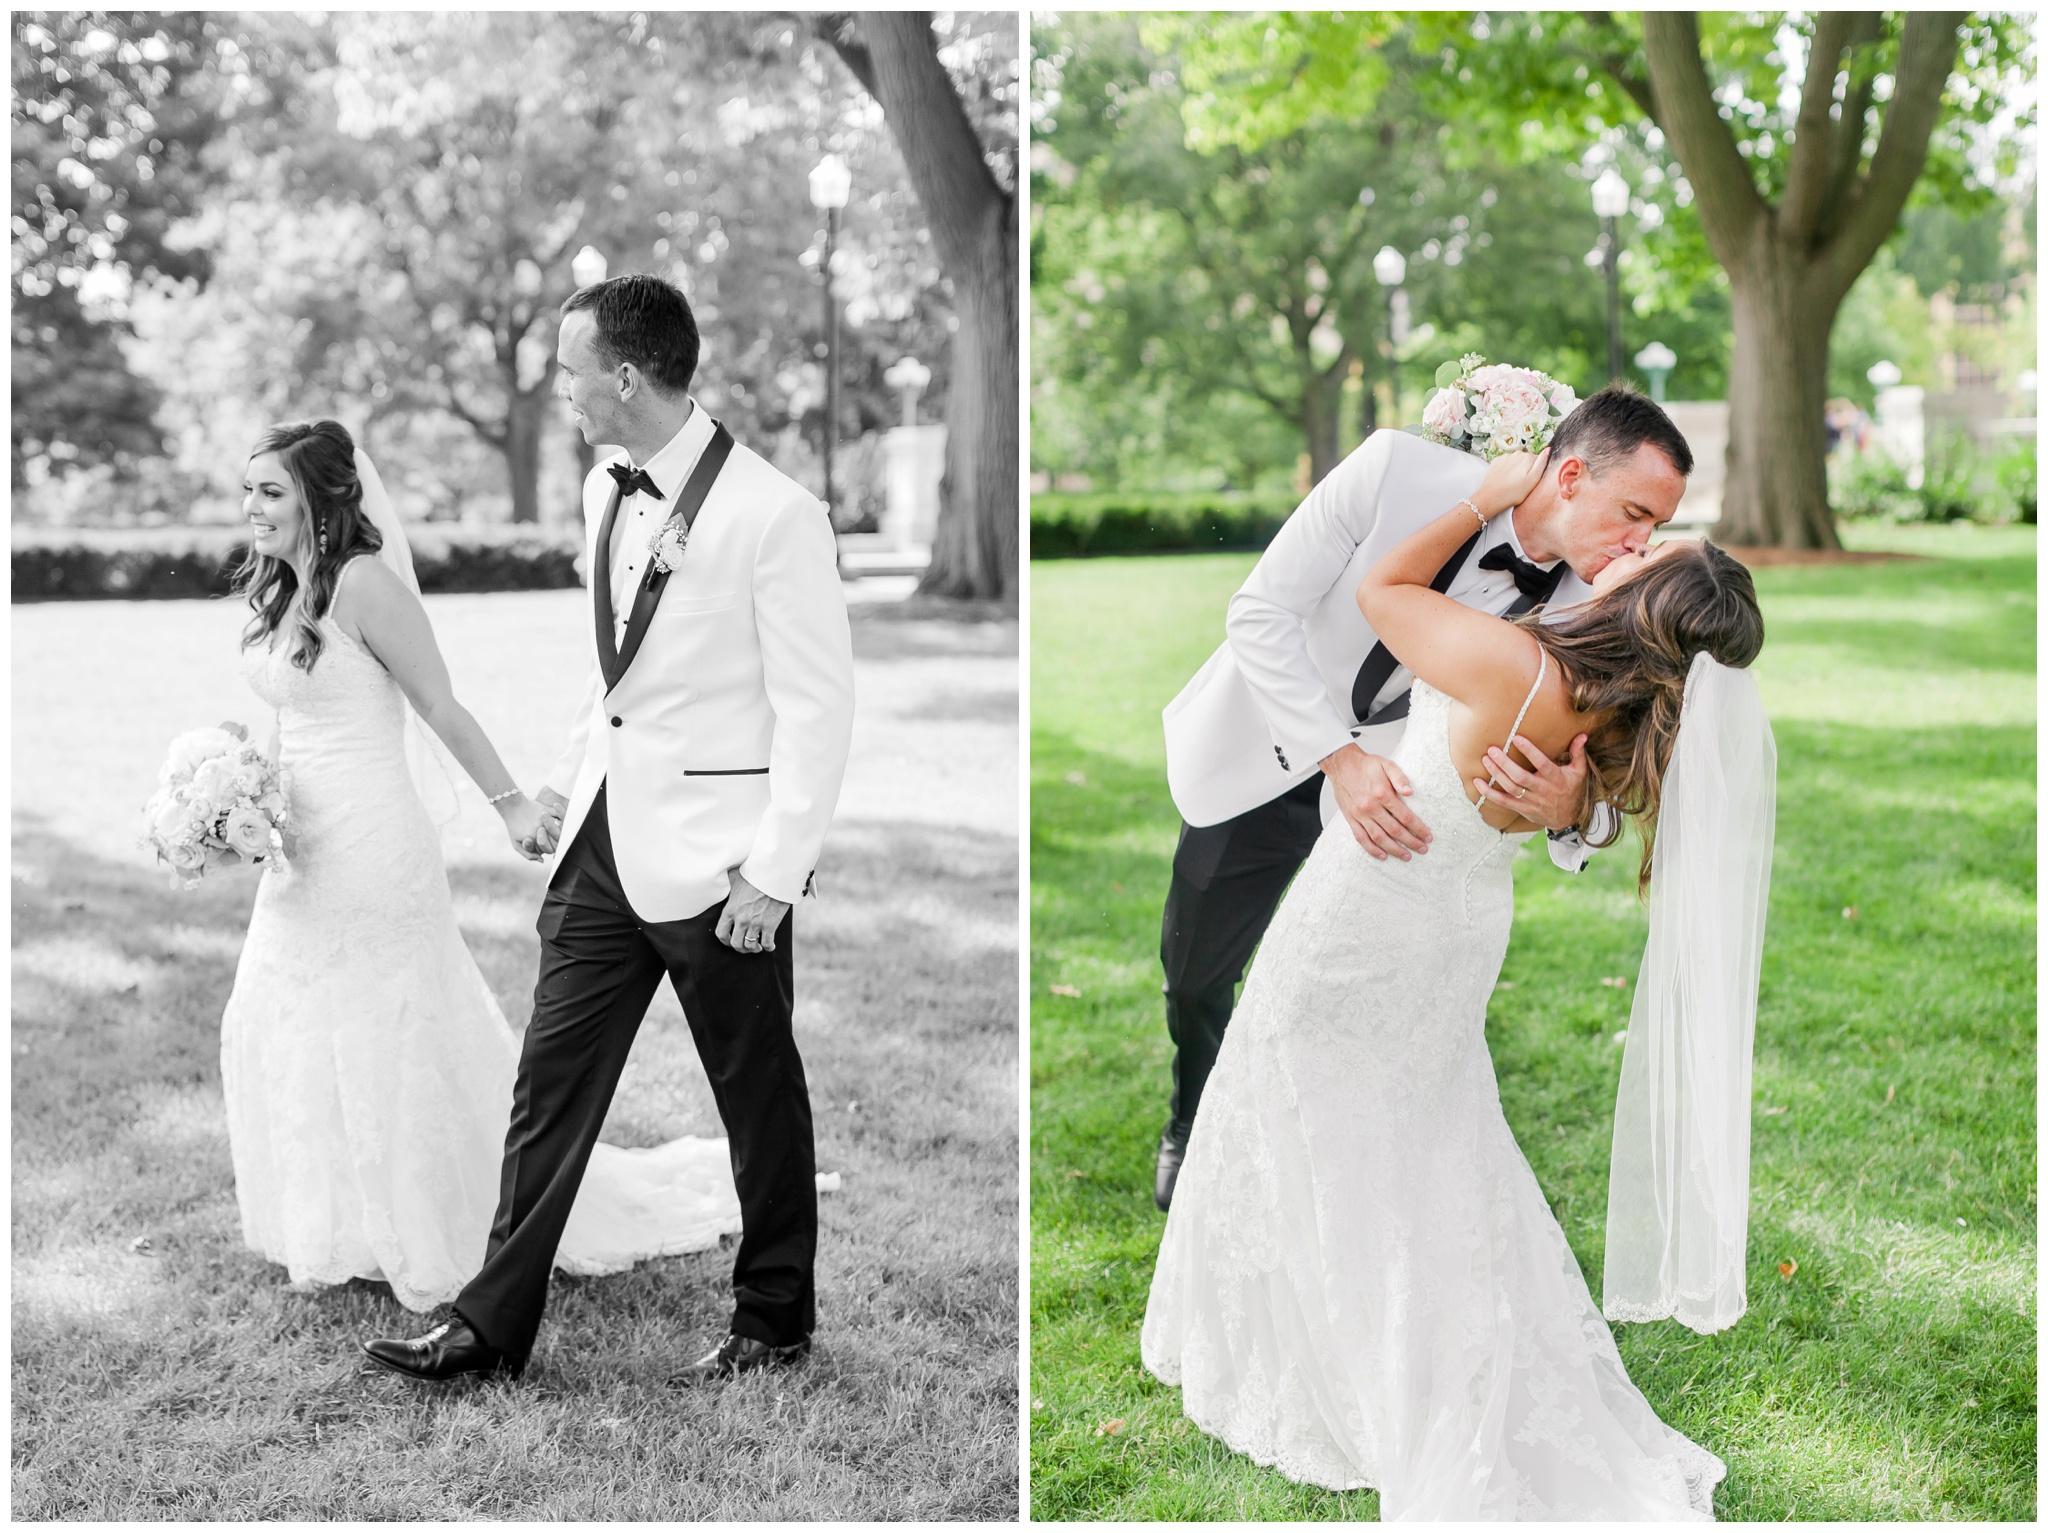 UW_Memorial_Union_wedding_madison_wisconsin_wedding_photographers_4625.jpg